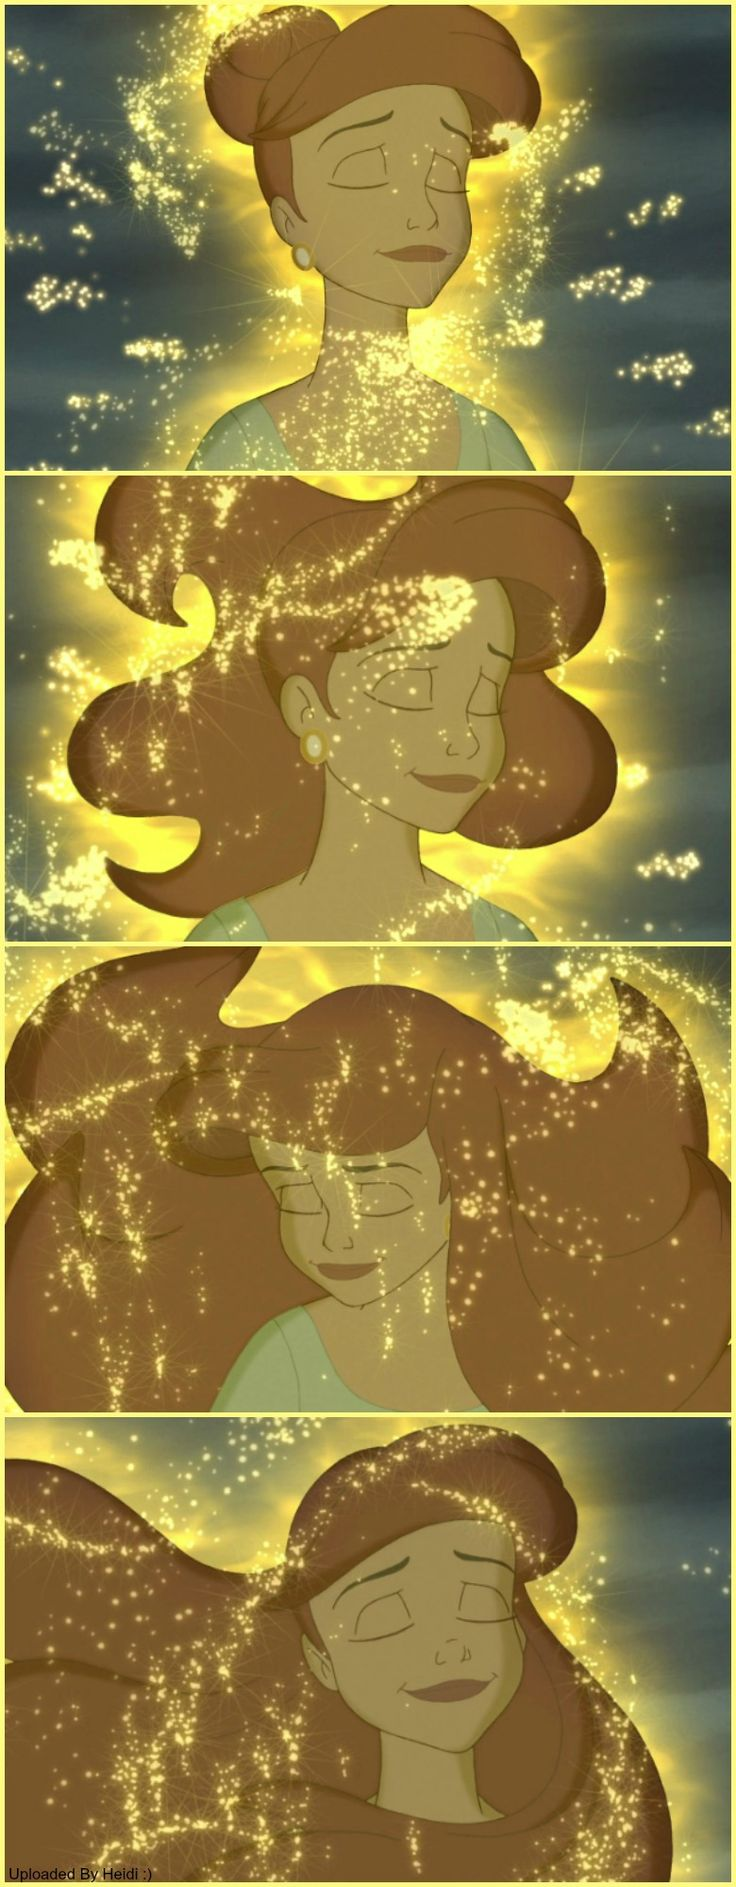 Ariel's beautiful transformation